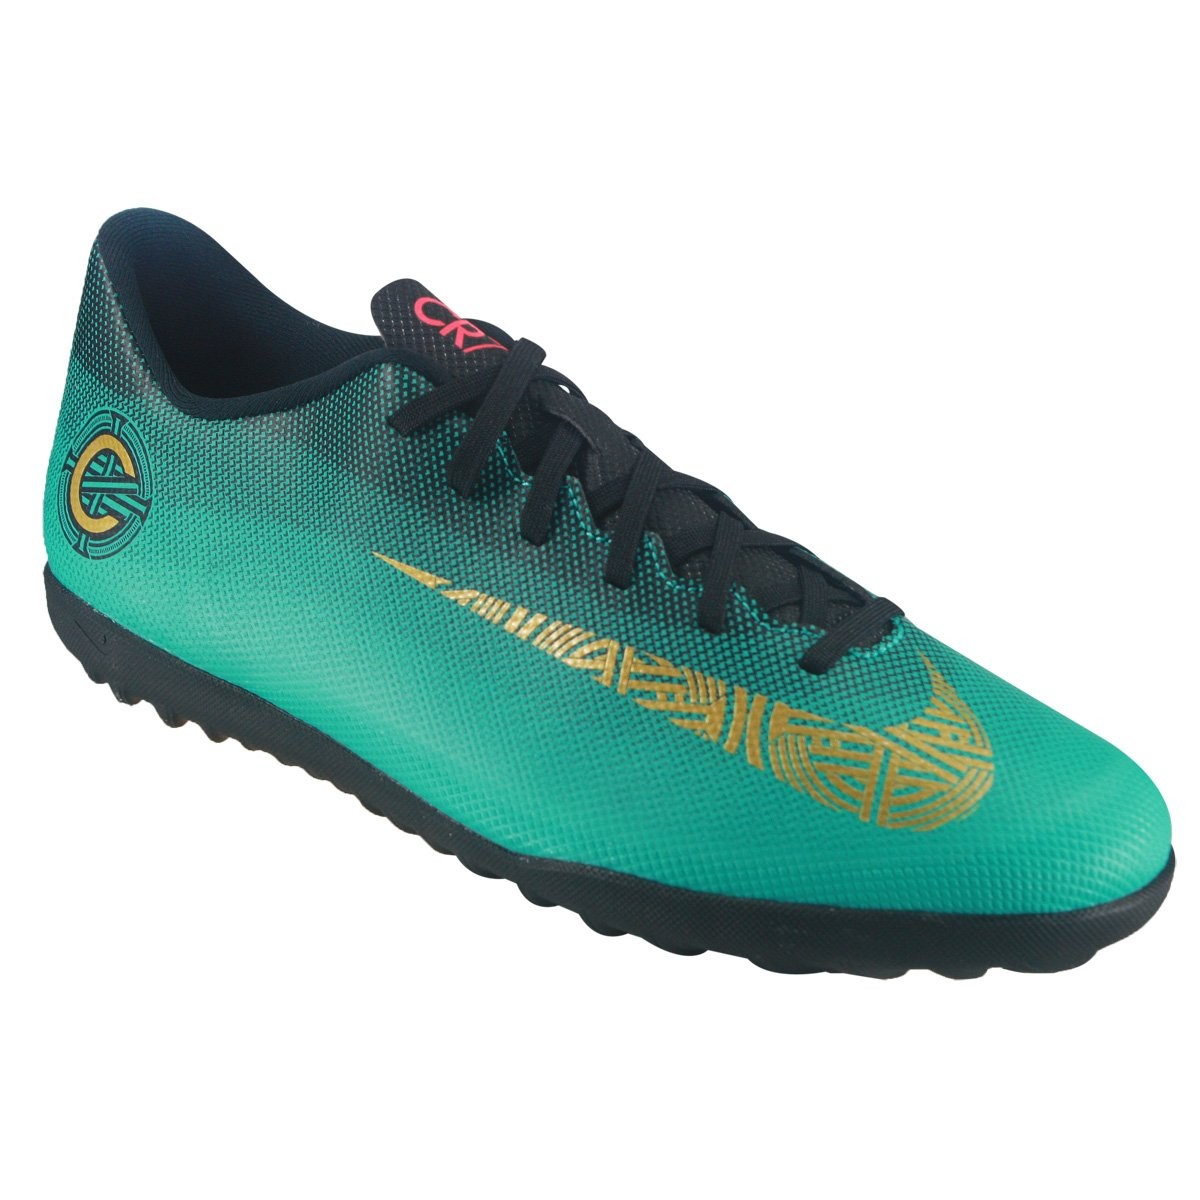 82afe0aa480ea ... NIKE MERCURIALX VAPOR 12 Zapatillas Nike Hombre Multitaco CR7 AJ3738  390 ...